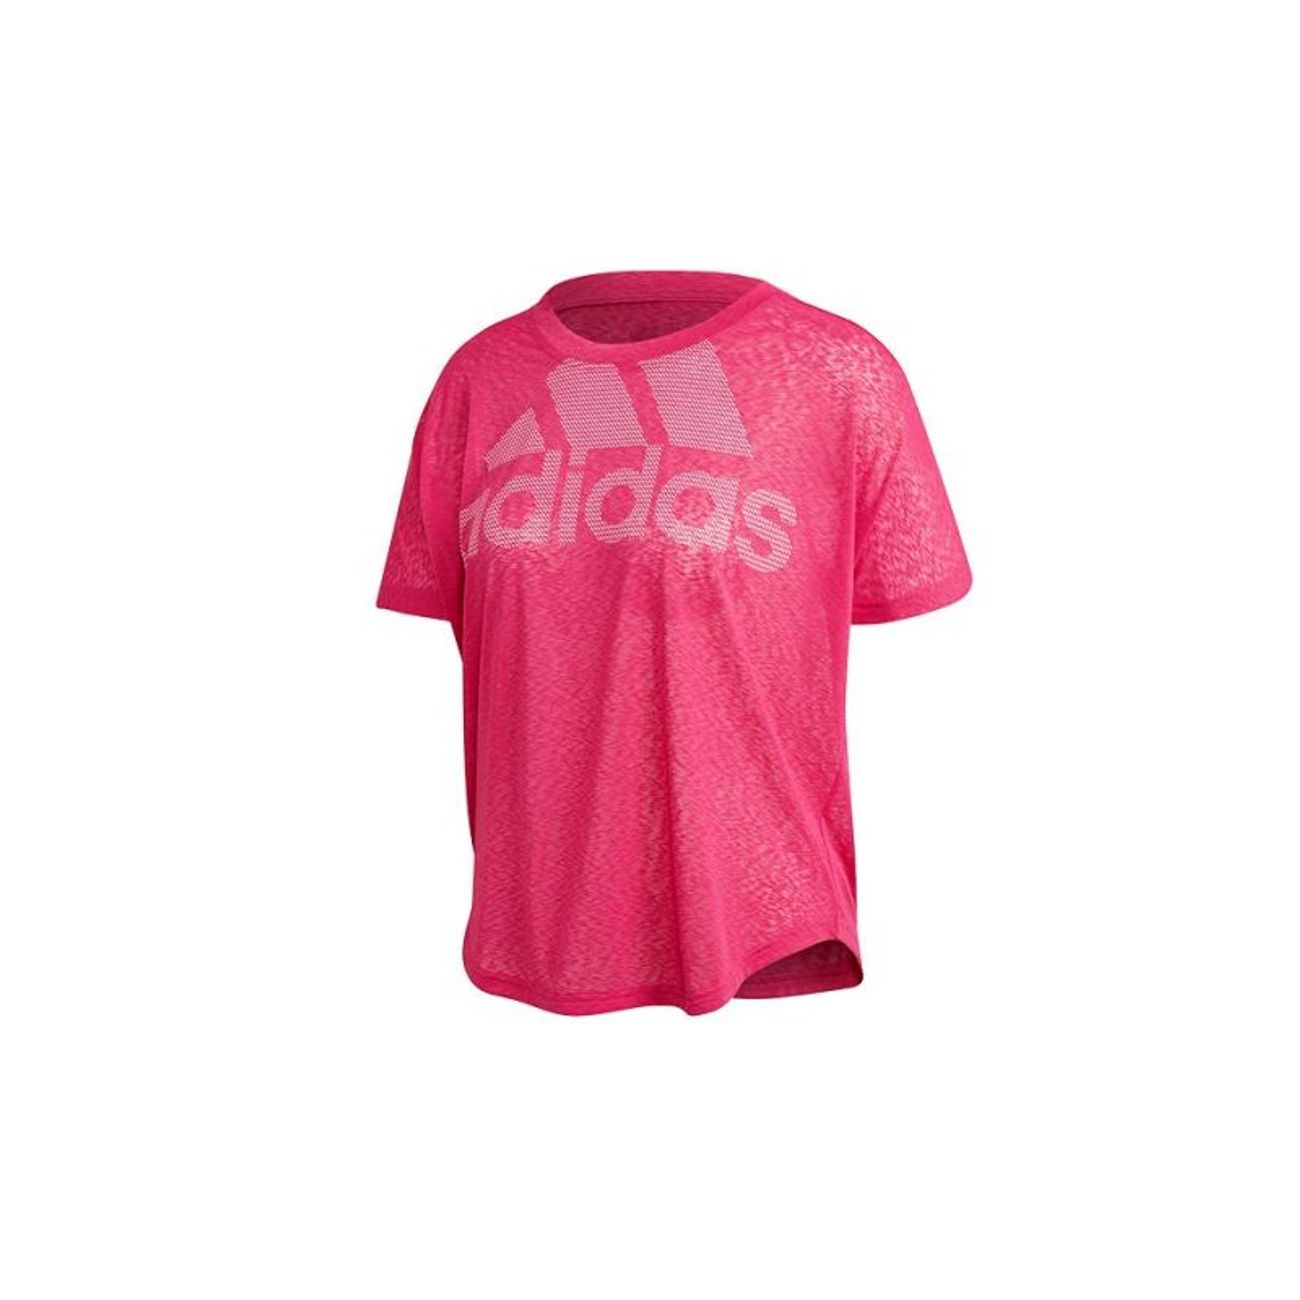 Magic T Logo Fitness Femme shirt Adidas tsdCrBhQx